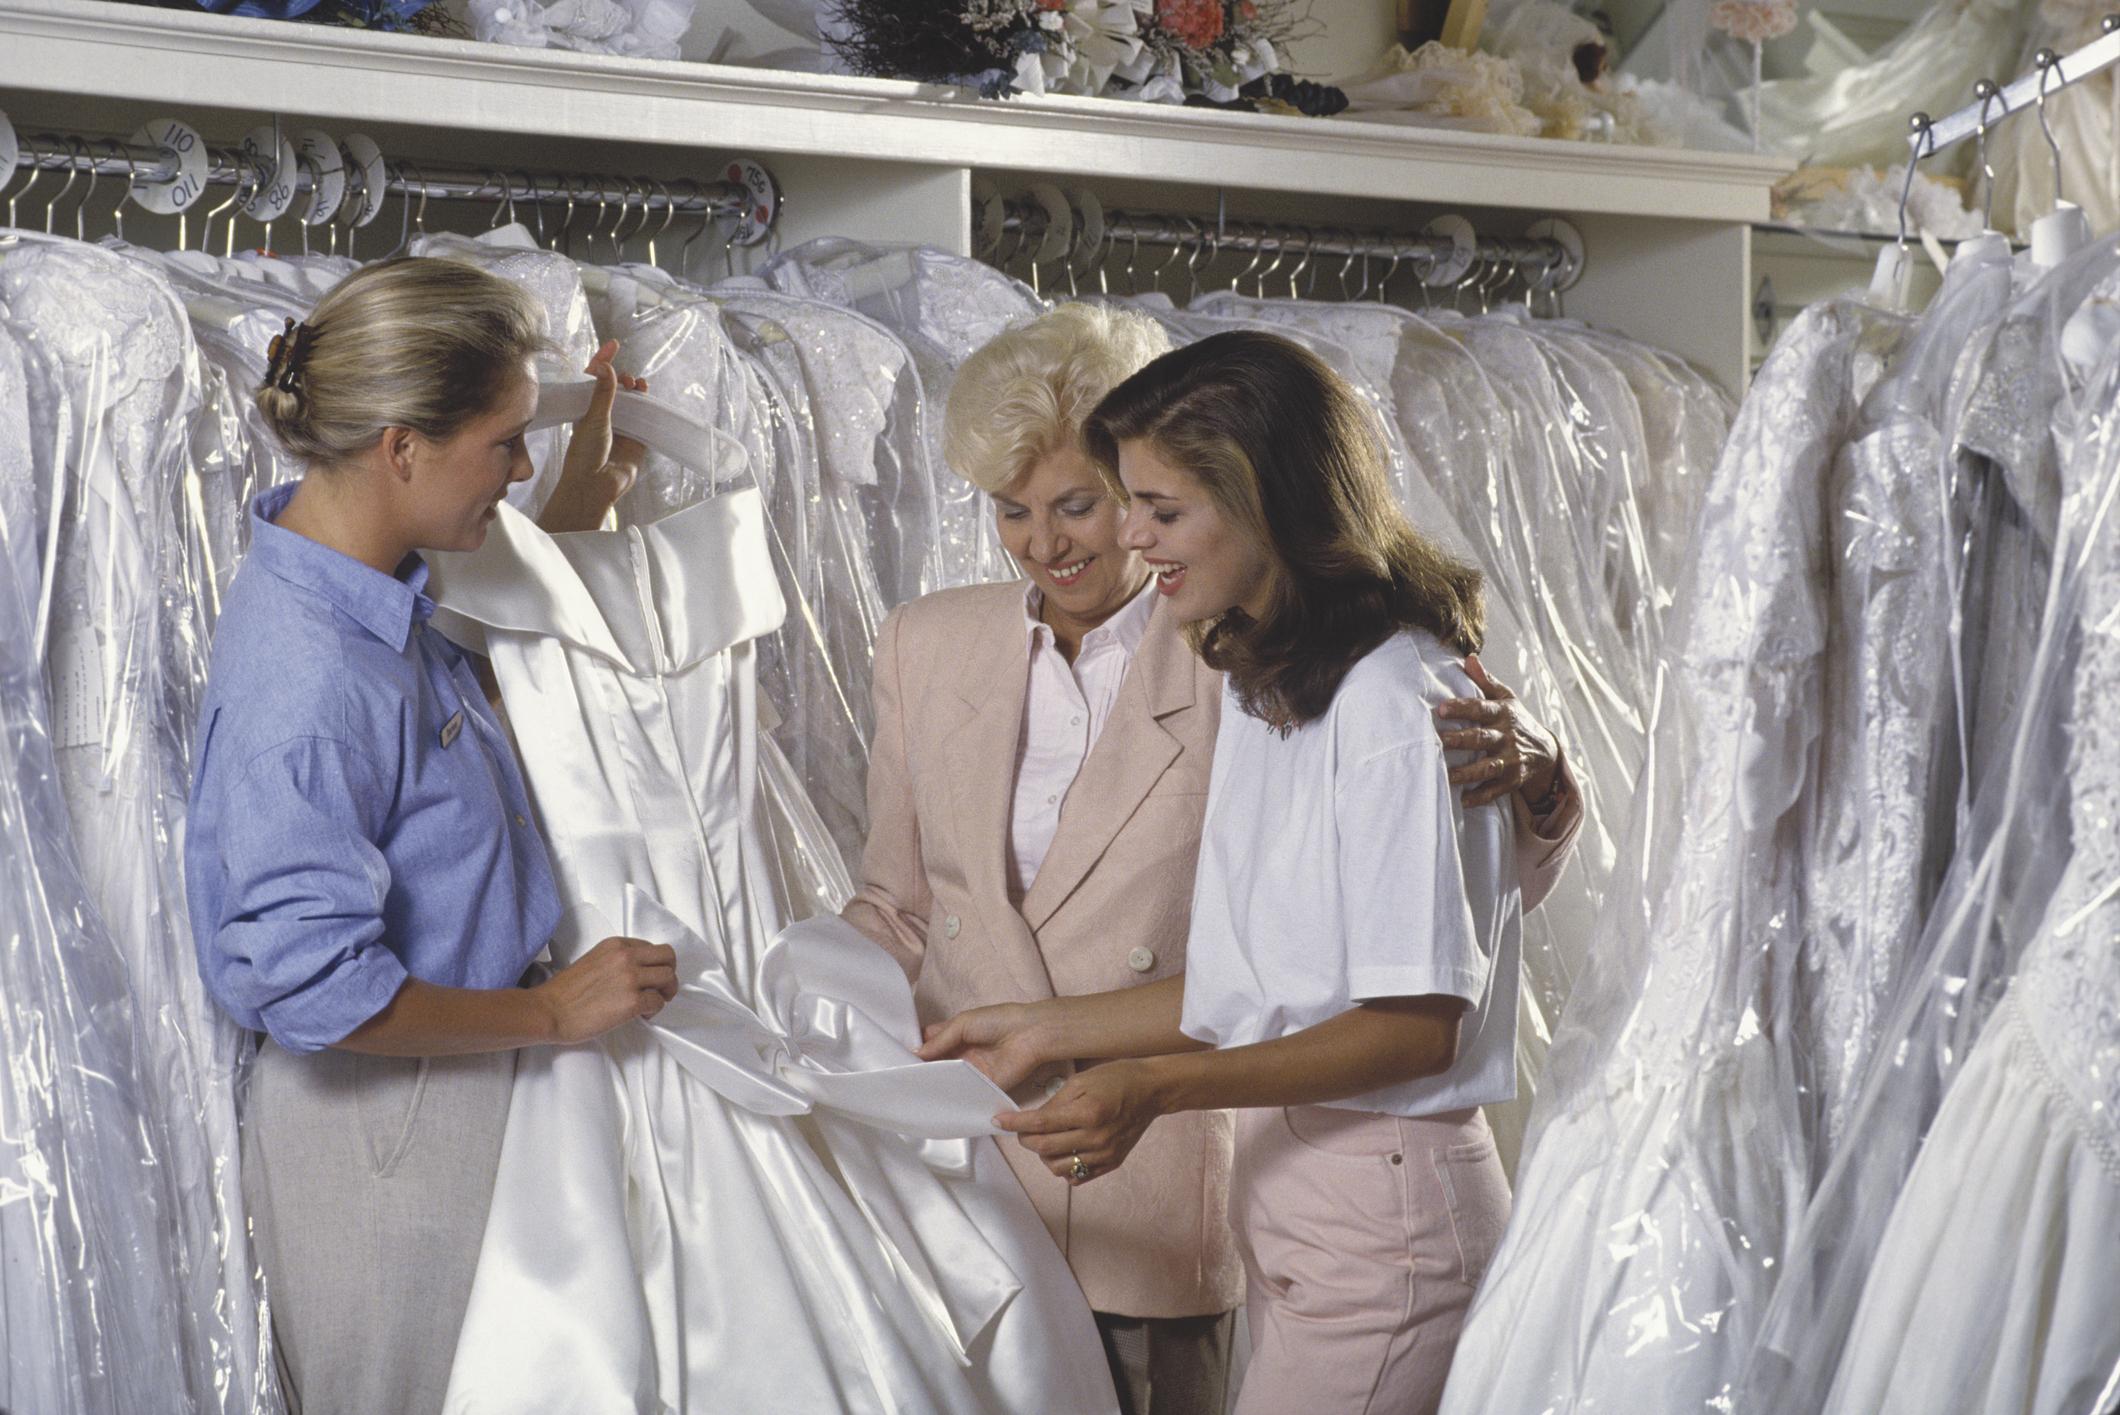 women-shopping-for-a-wedding-dressjpg